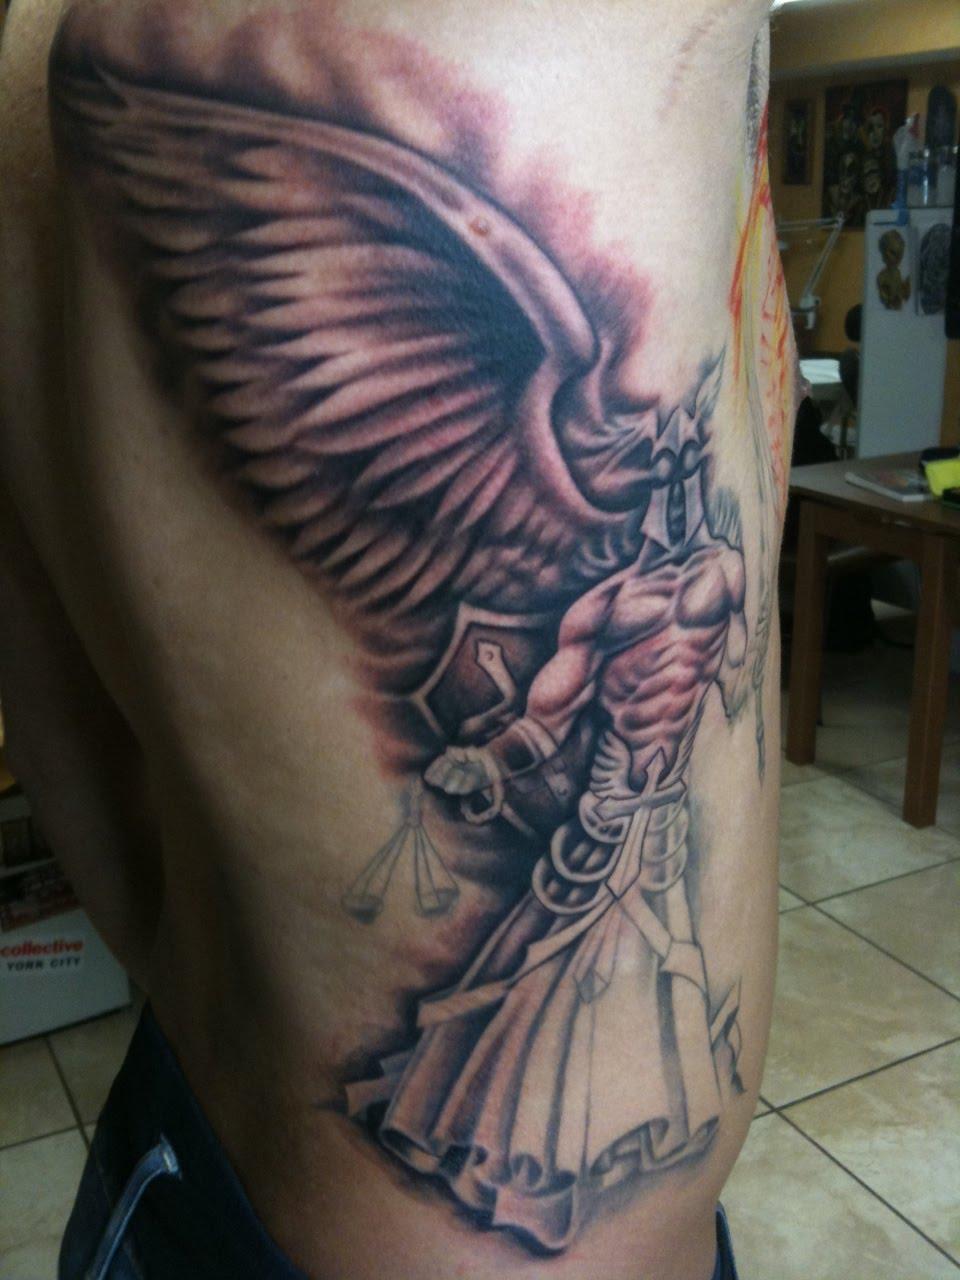 Keith Ciaramello Tattoos & Fine Art: Freehand Archangel